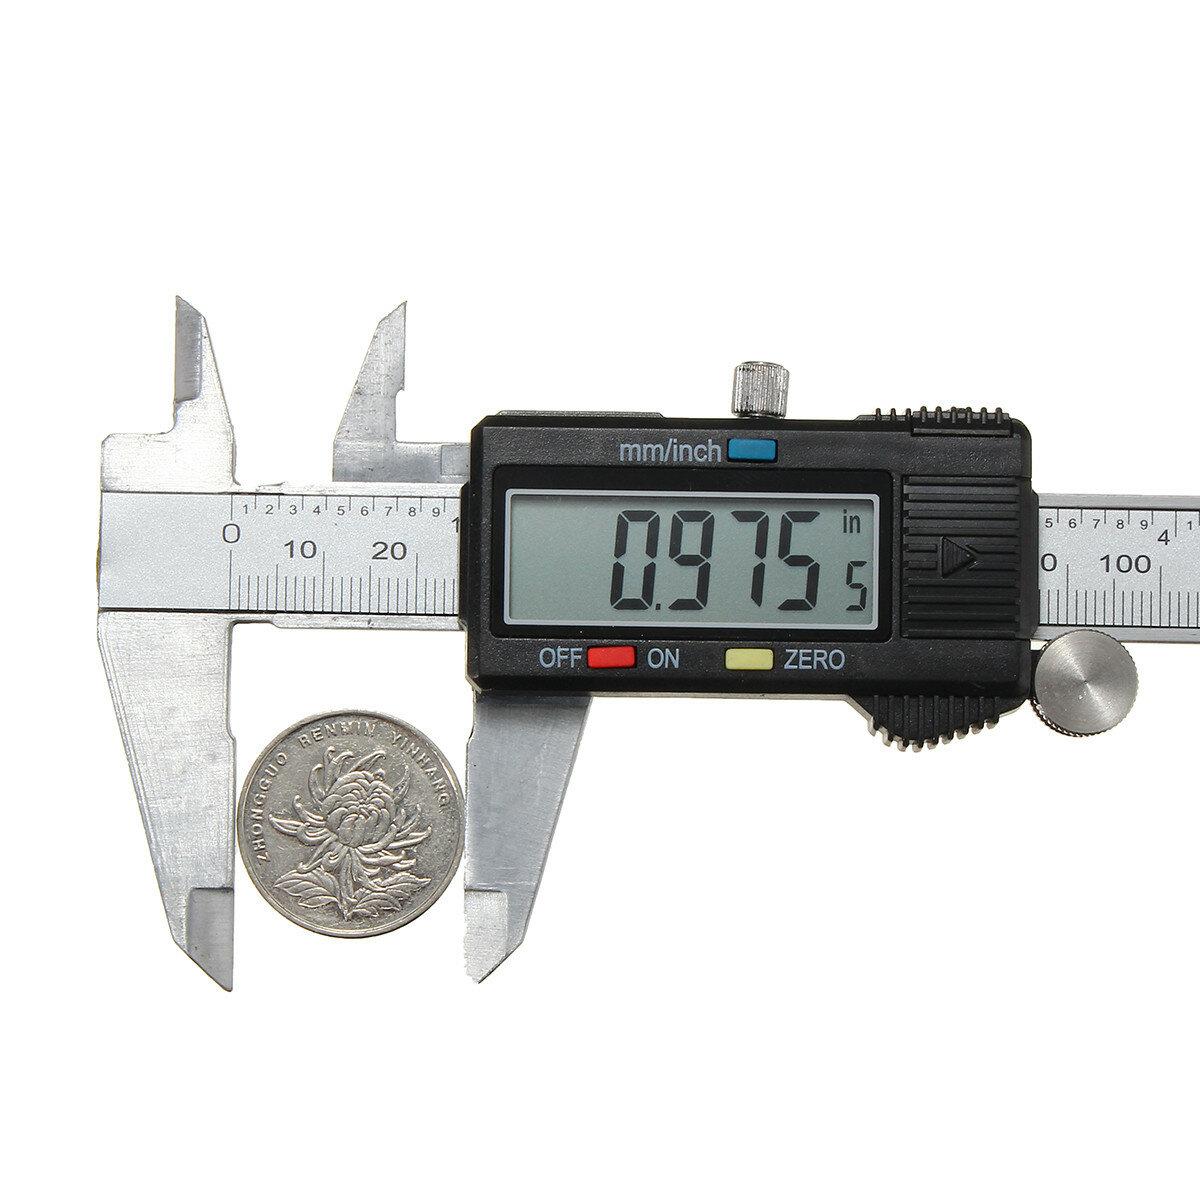 6 Inch 150mm Digital Stainless Vernier Caliper Electronic